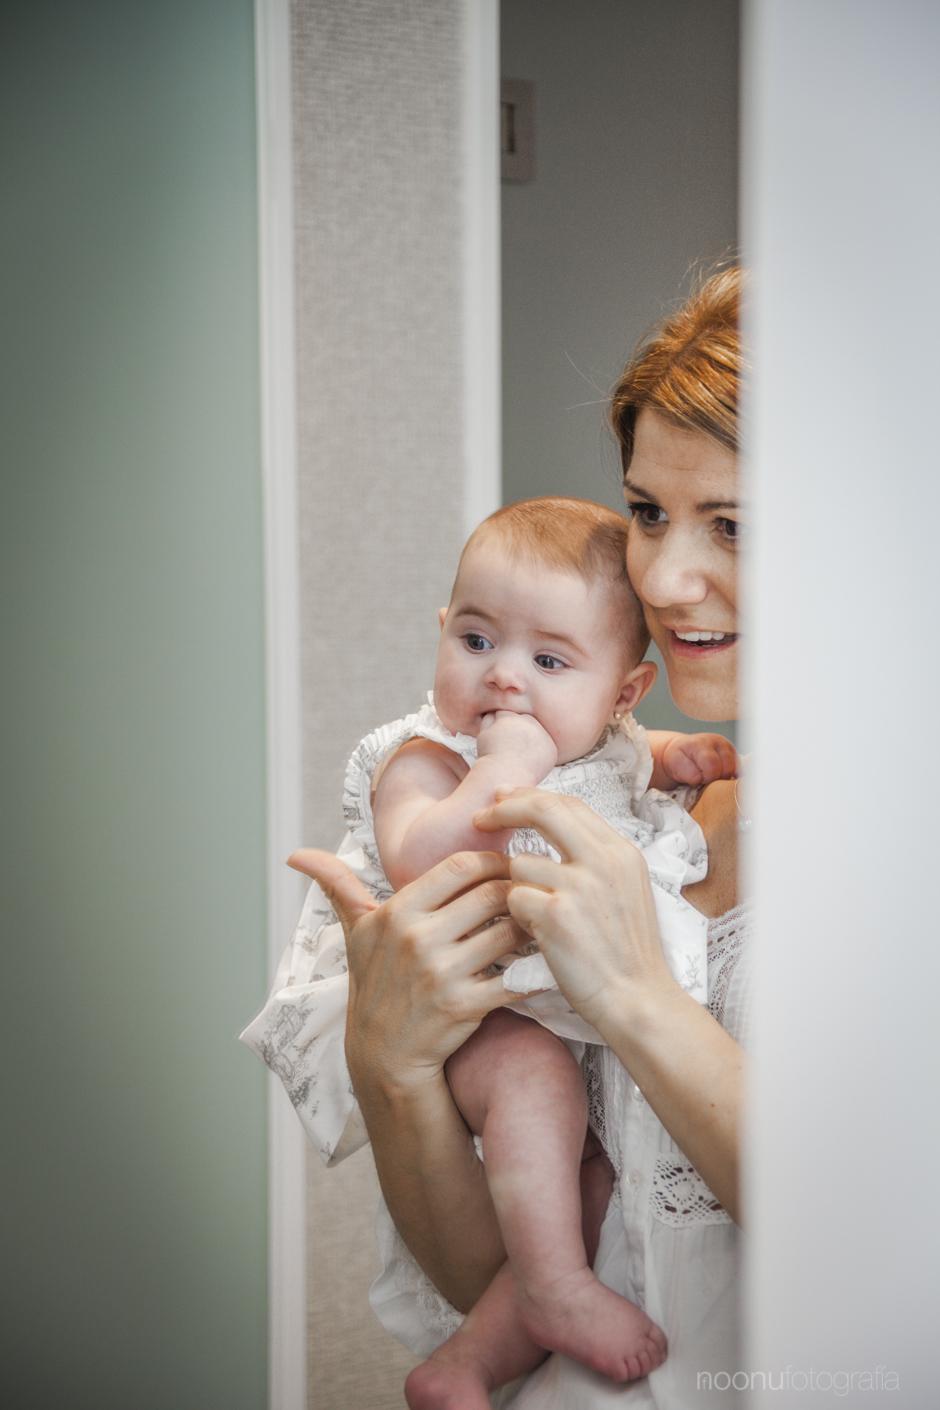 Noonu-fotografos-de-bebes-madrid-Greta 2-2